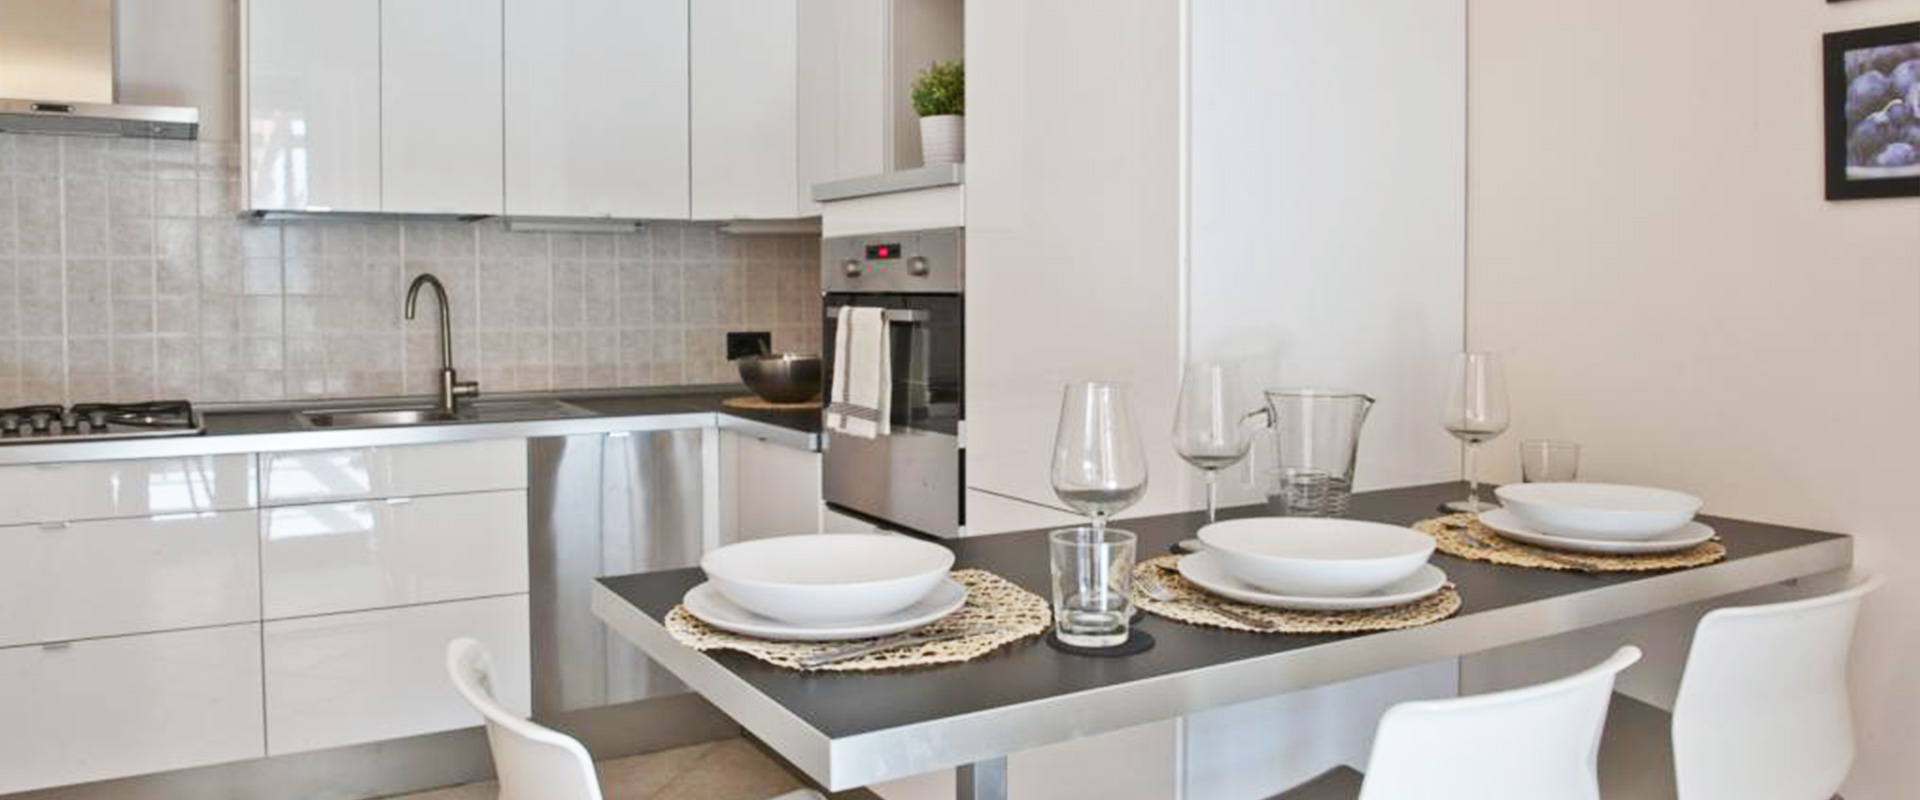 Corte Felice Residenza - cucina